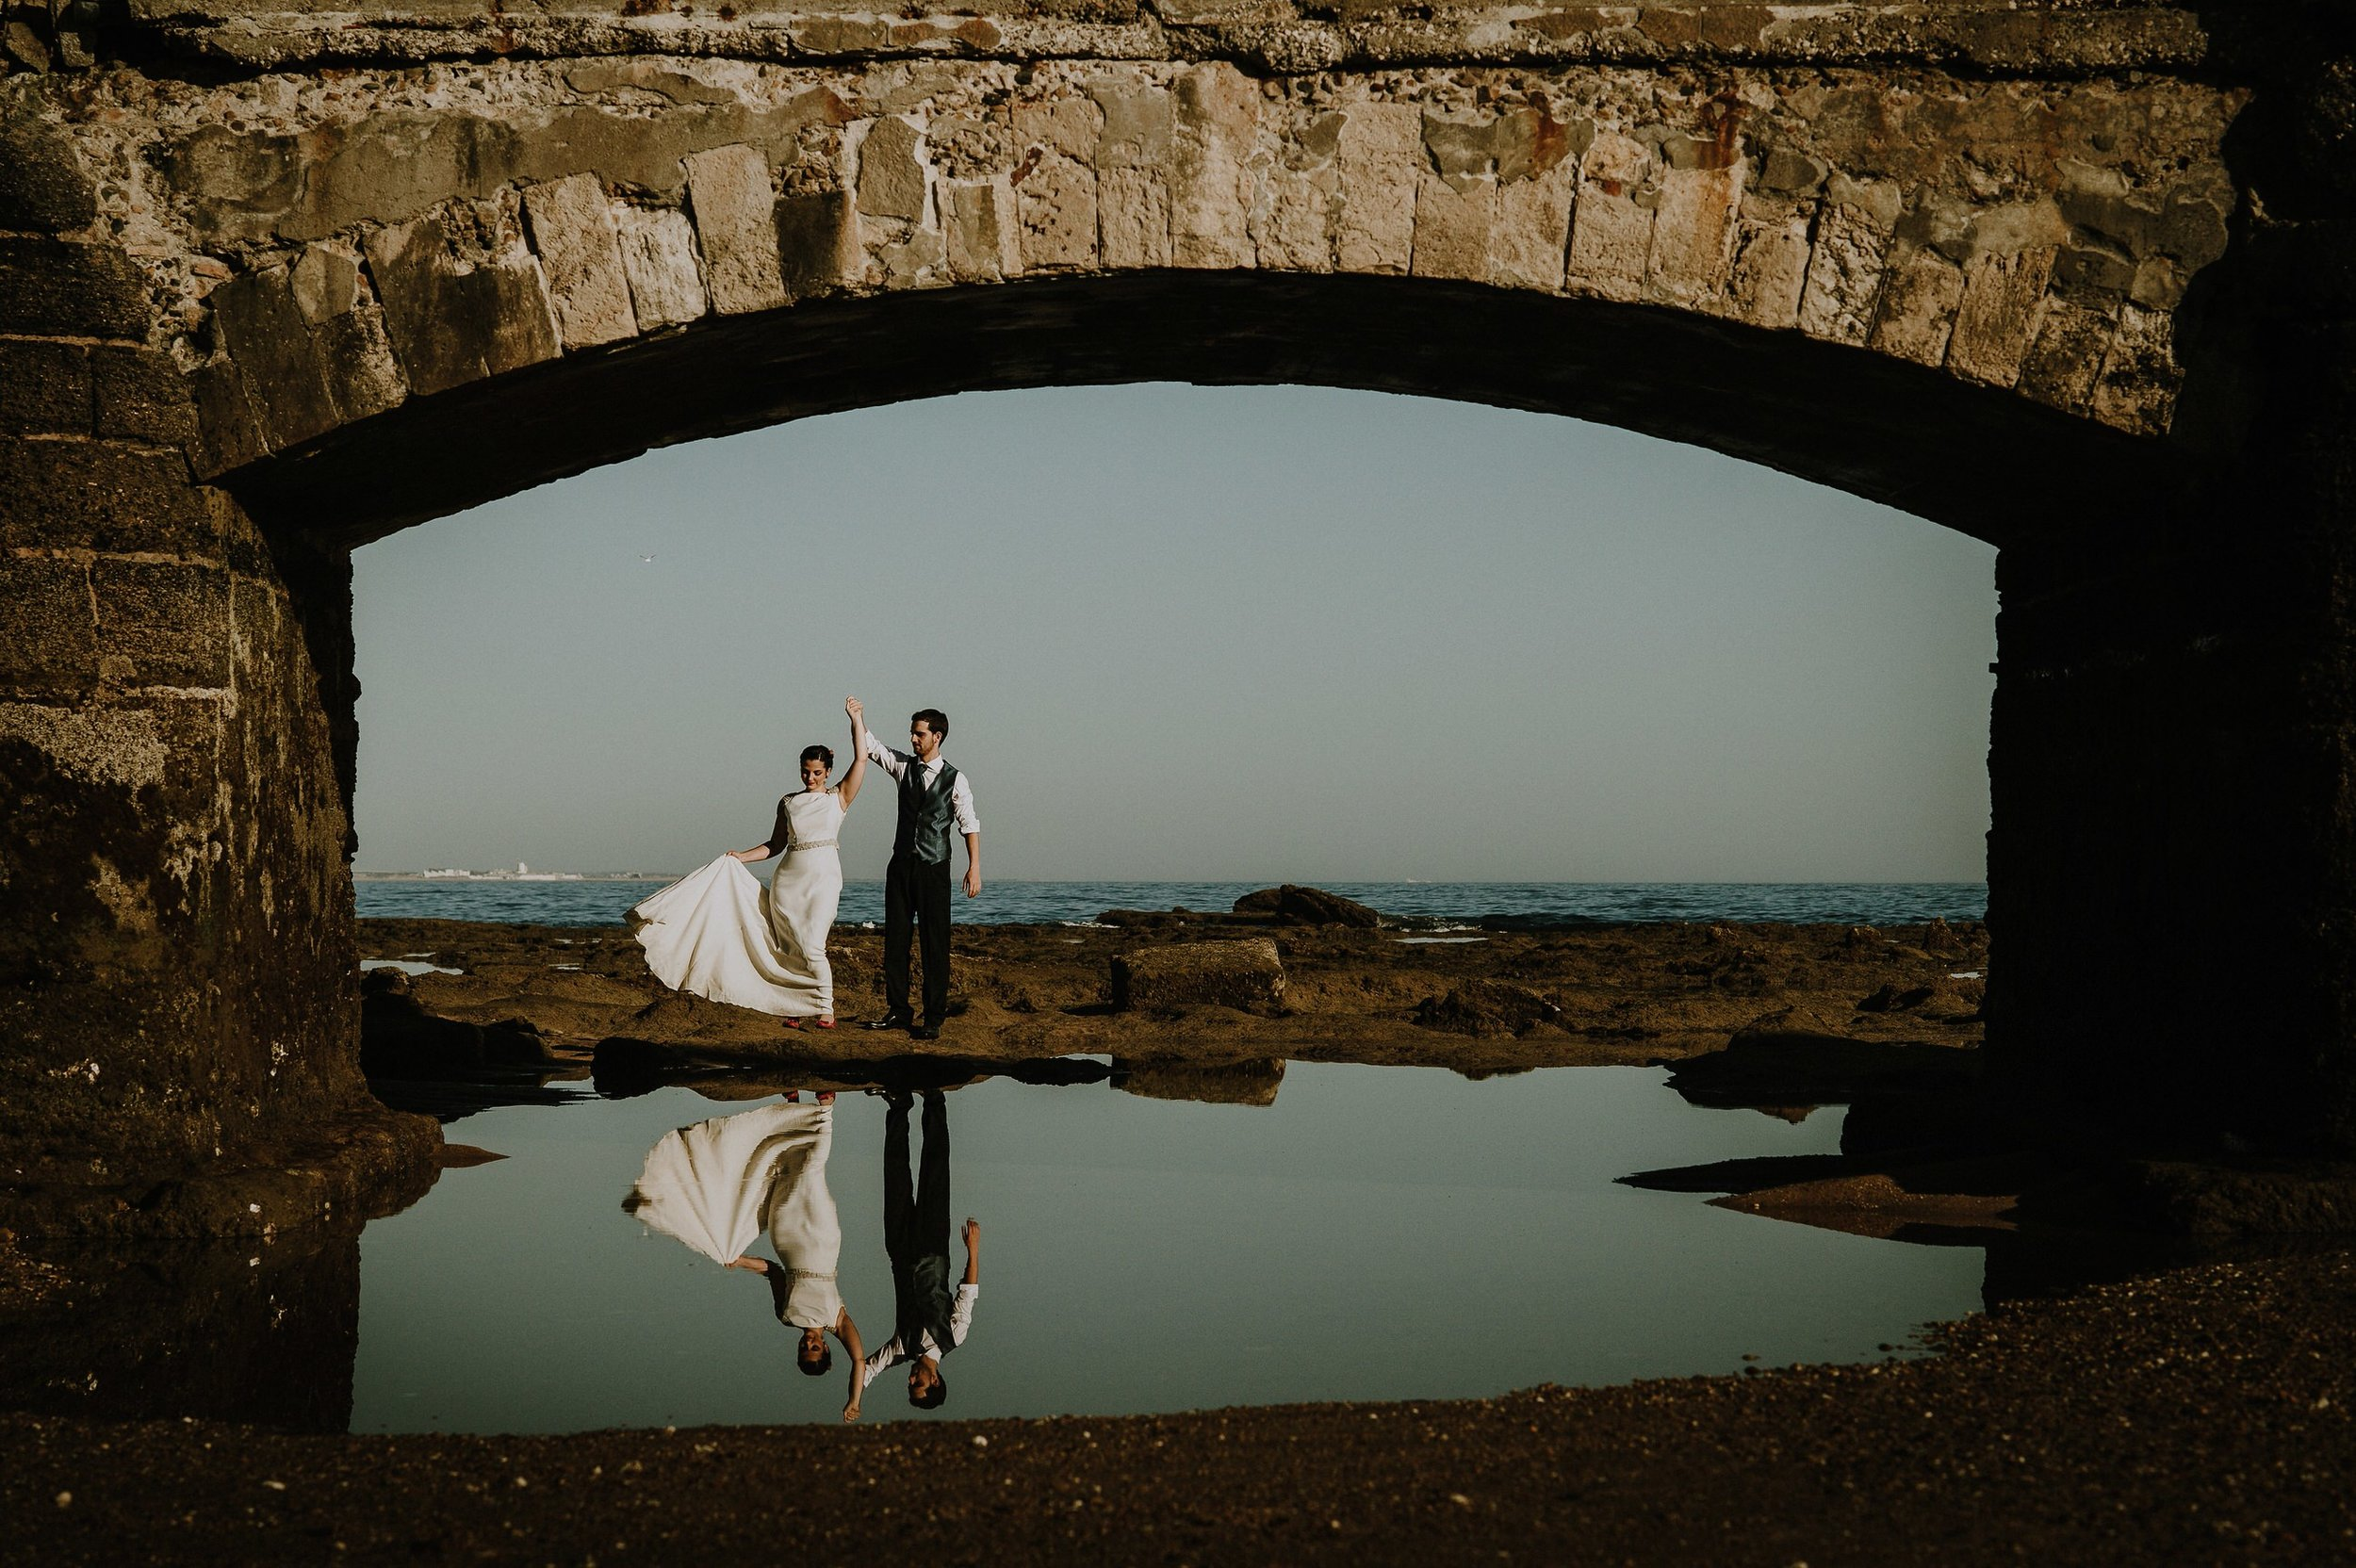 Laura & Rubén - boda en utrera - Santa clotilde- Manolo mayo - Fotografo de boda - Andrés Amarillo AAA_1075-Exposure (110).jpg